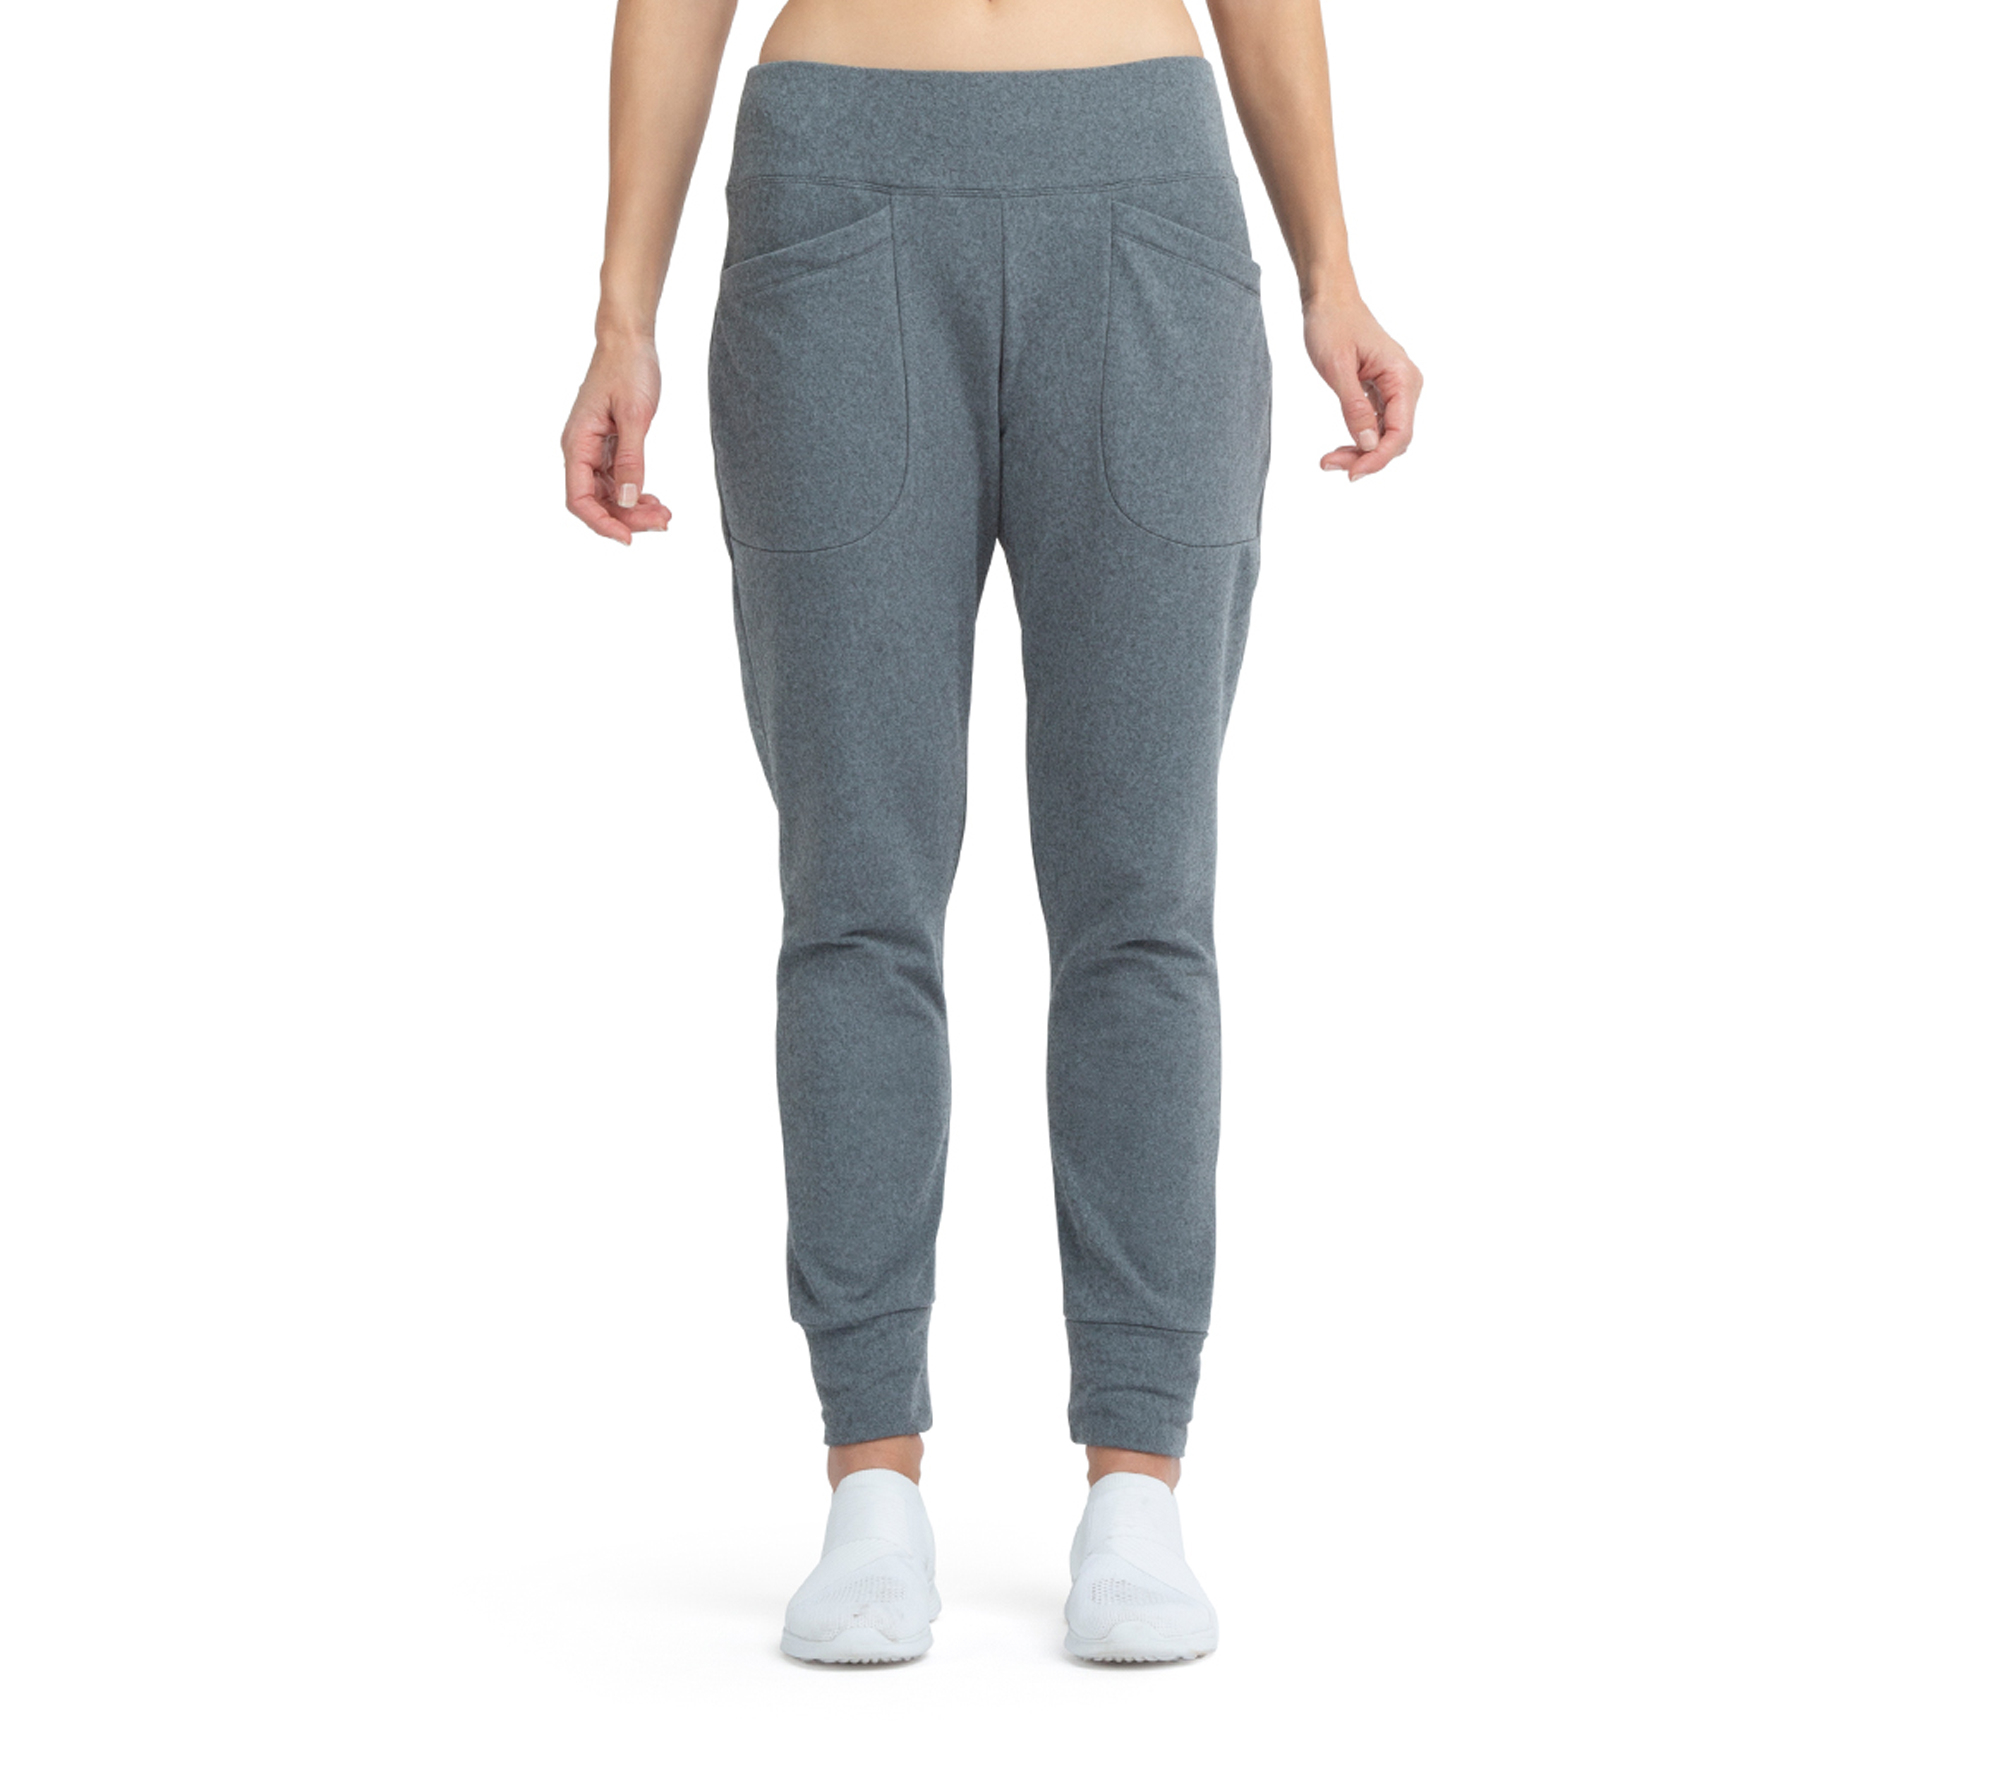 Pantaloni tecnici Power-stretch